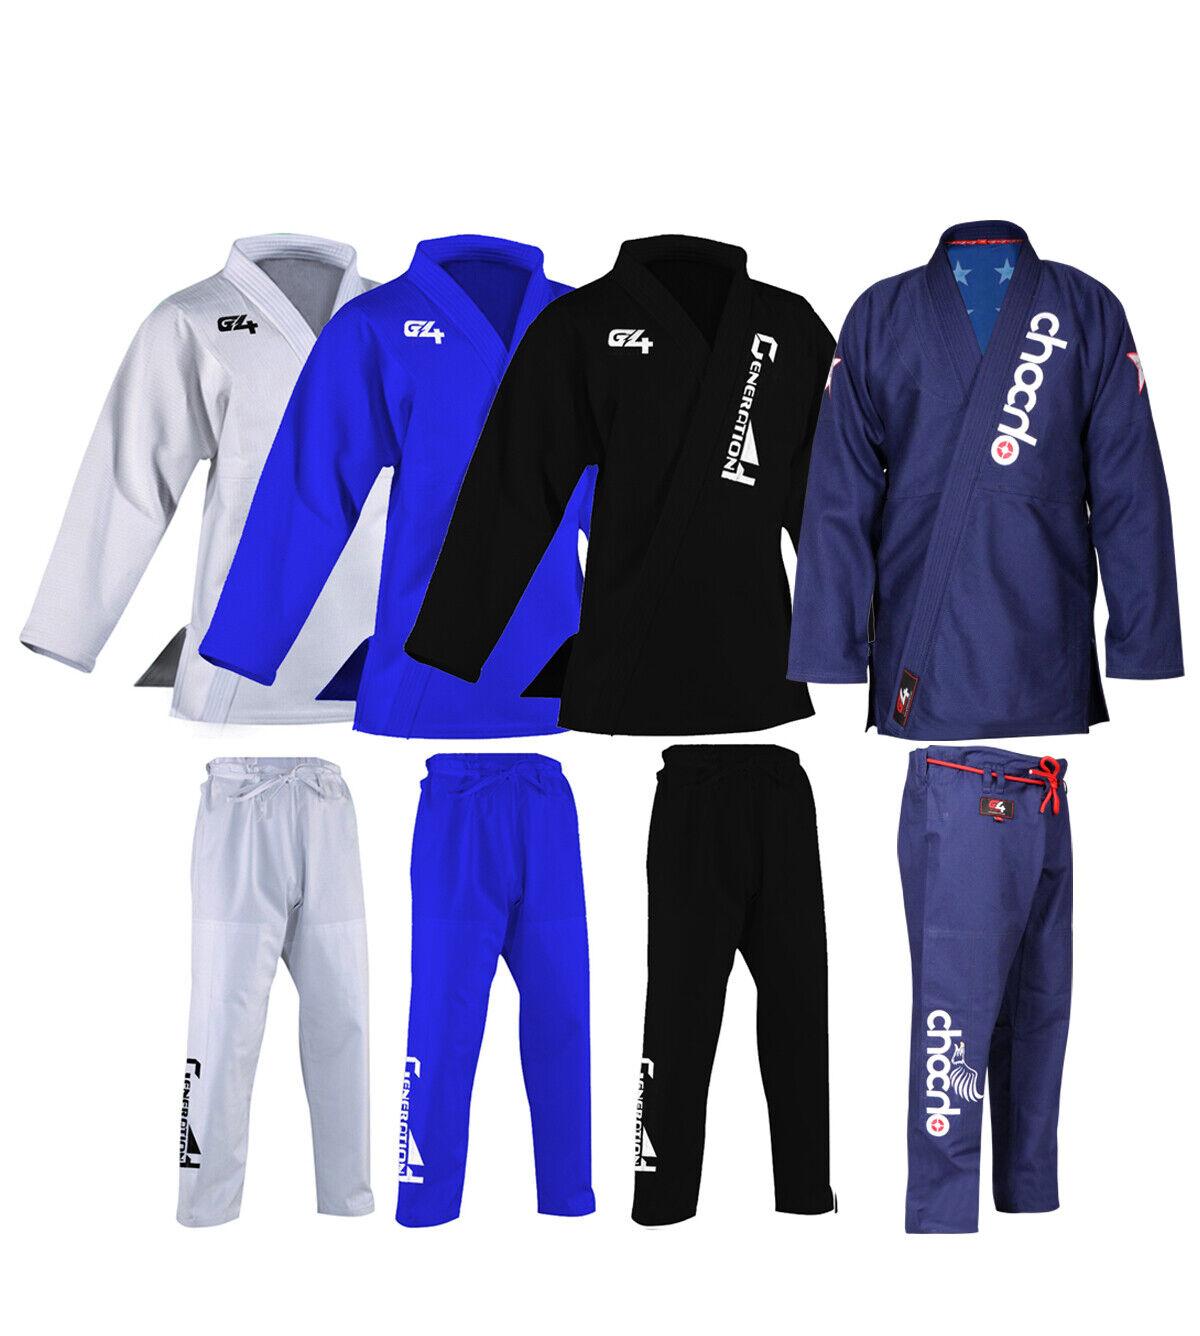 Venum Contender 2.0 BJJ Gi Jiu Jitsu Suit Uniform Blue White Black Navy Mens